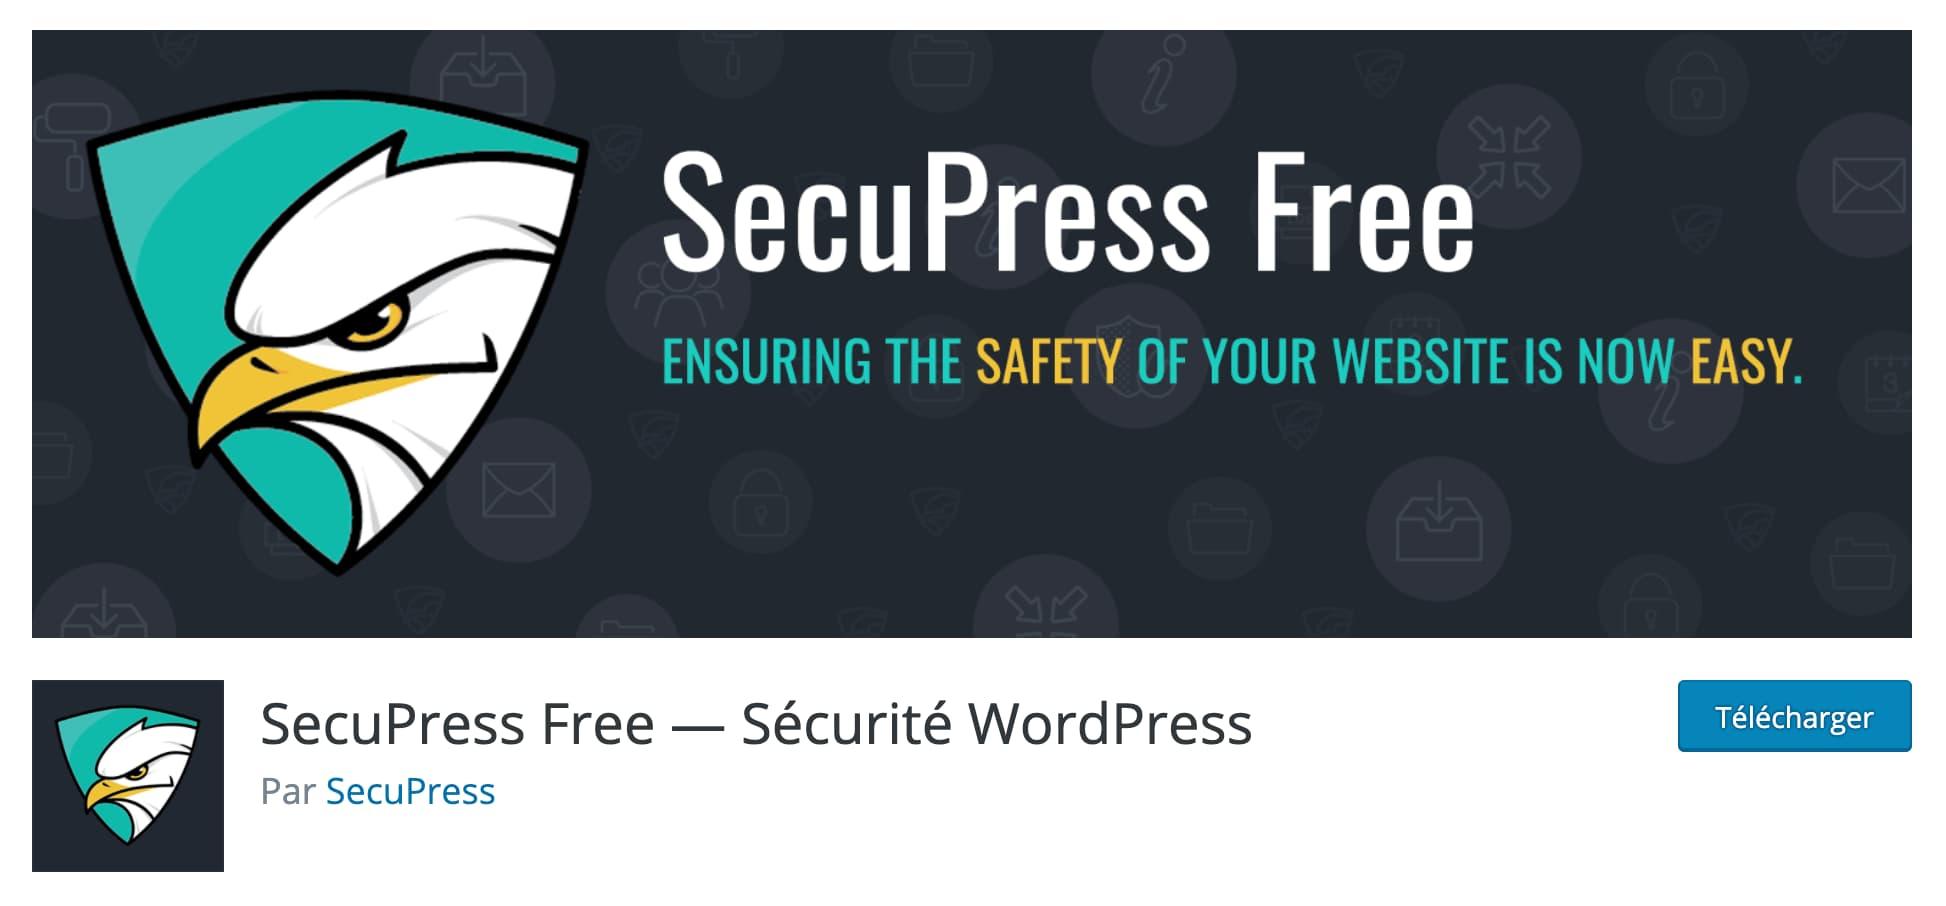 SecuPress - Sécurité WordPress